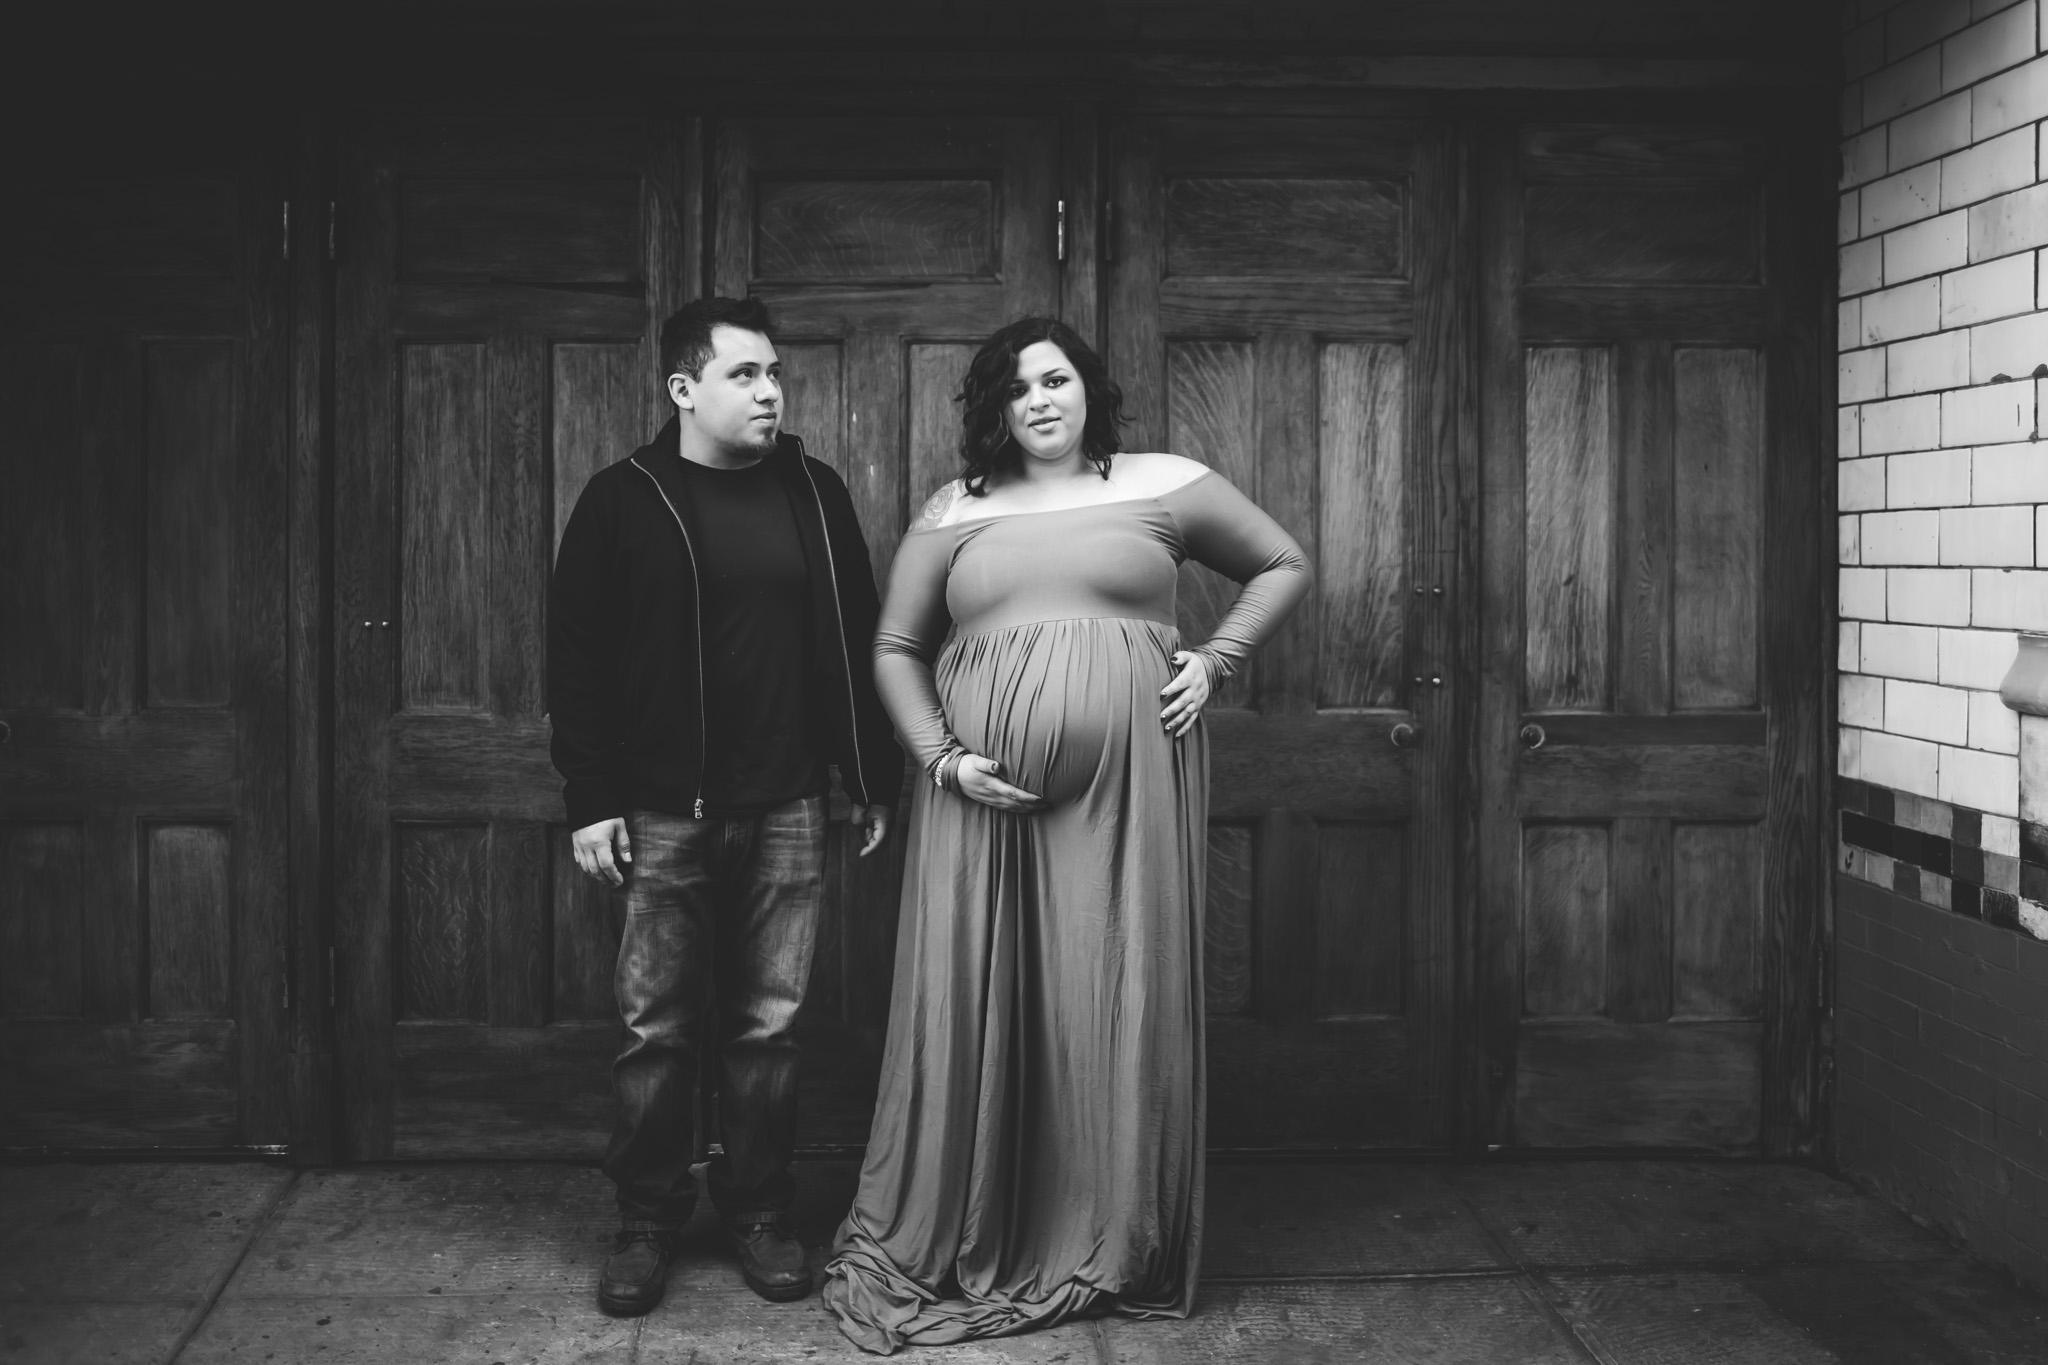 DannieMelissaWit_AbeillePhotography.com_Newborn_Maternity_Lifestyle_Photographer_Zari-31.jpg